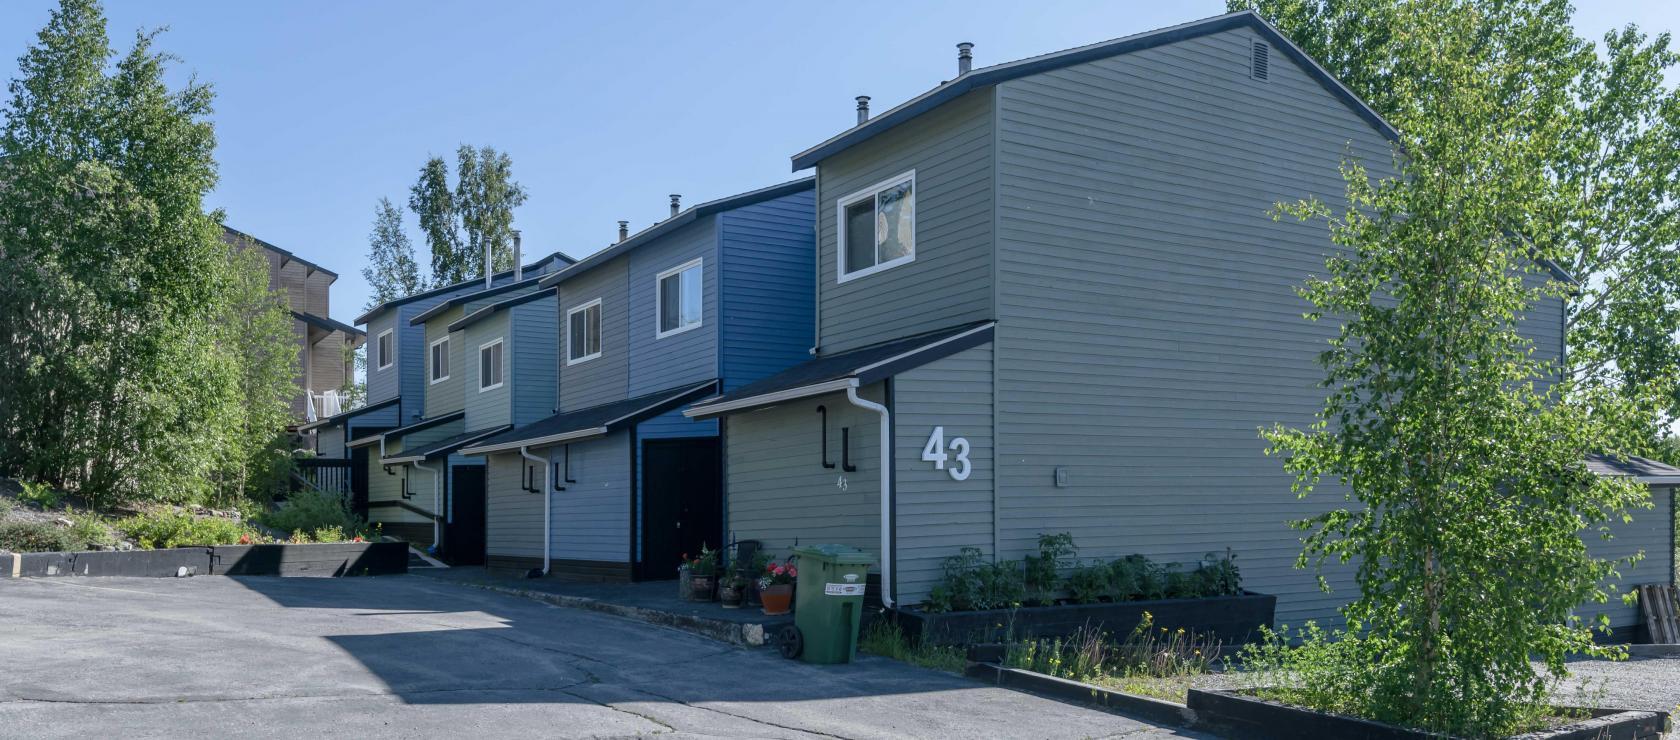 1054 - 43 Rycon Drive, Con Road, Yellowknife 2